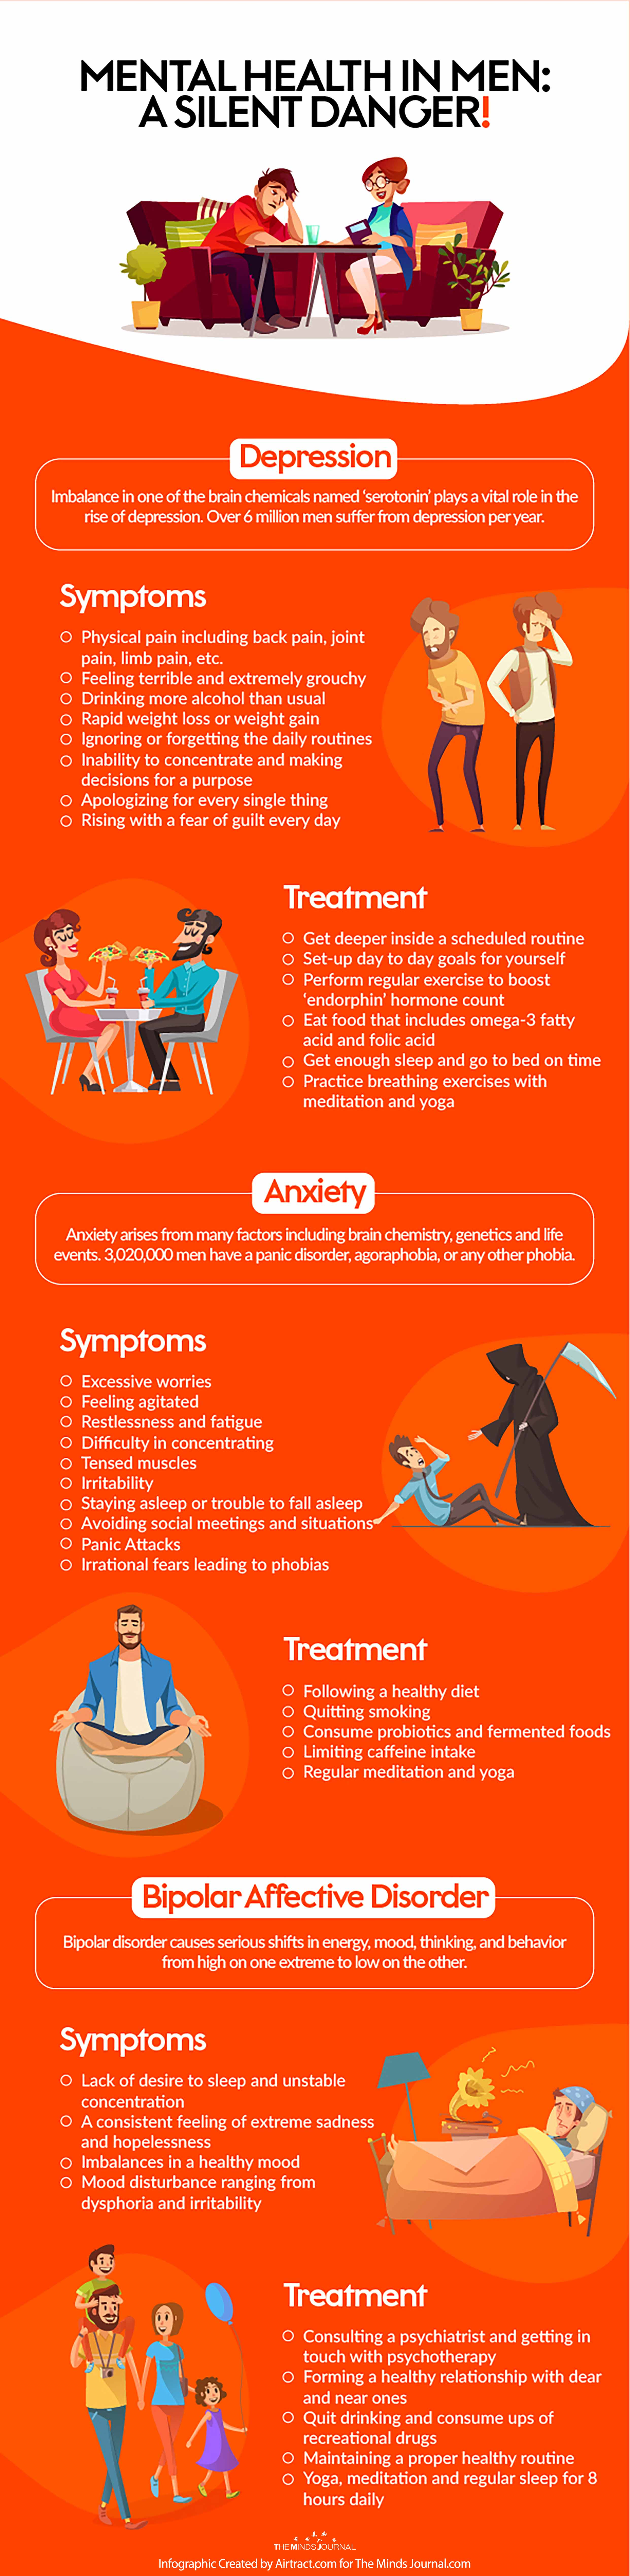 mental health in men